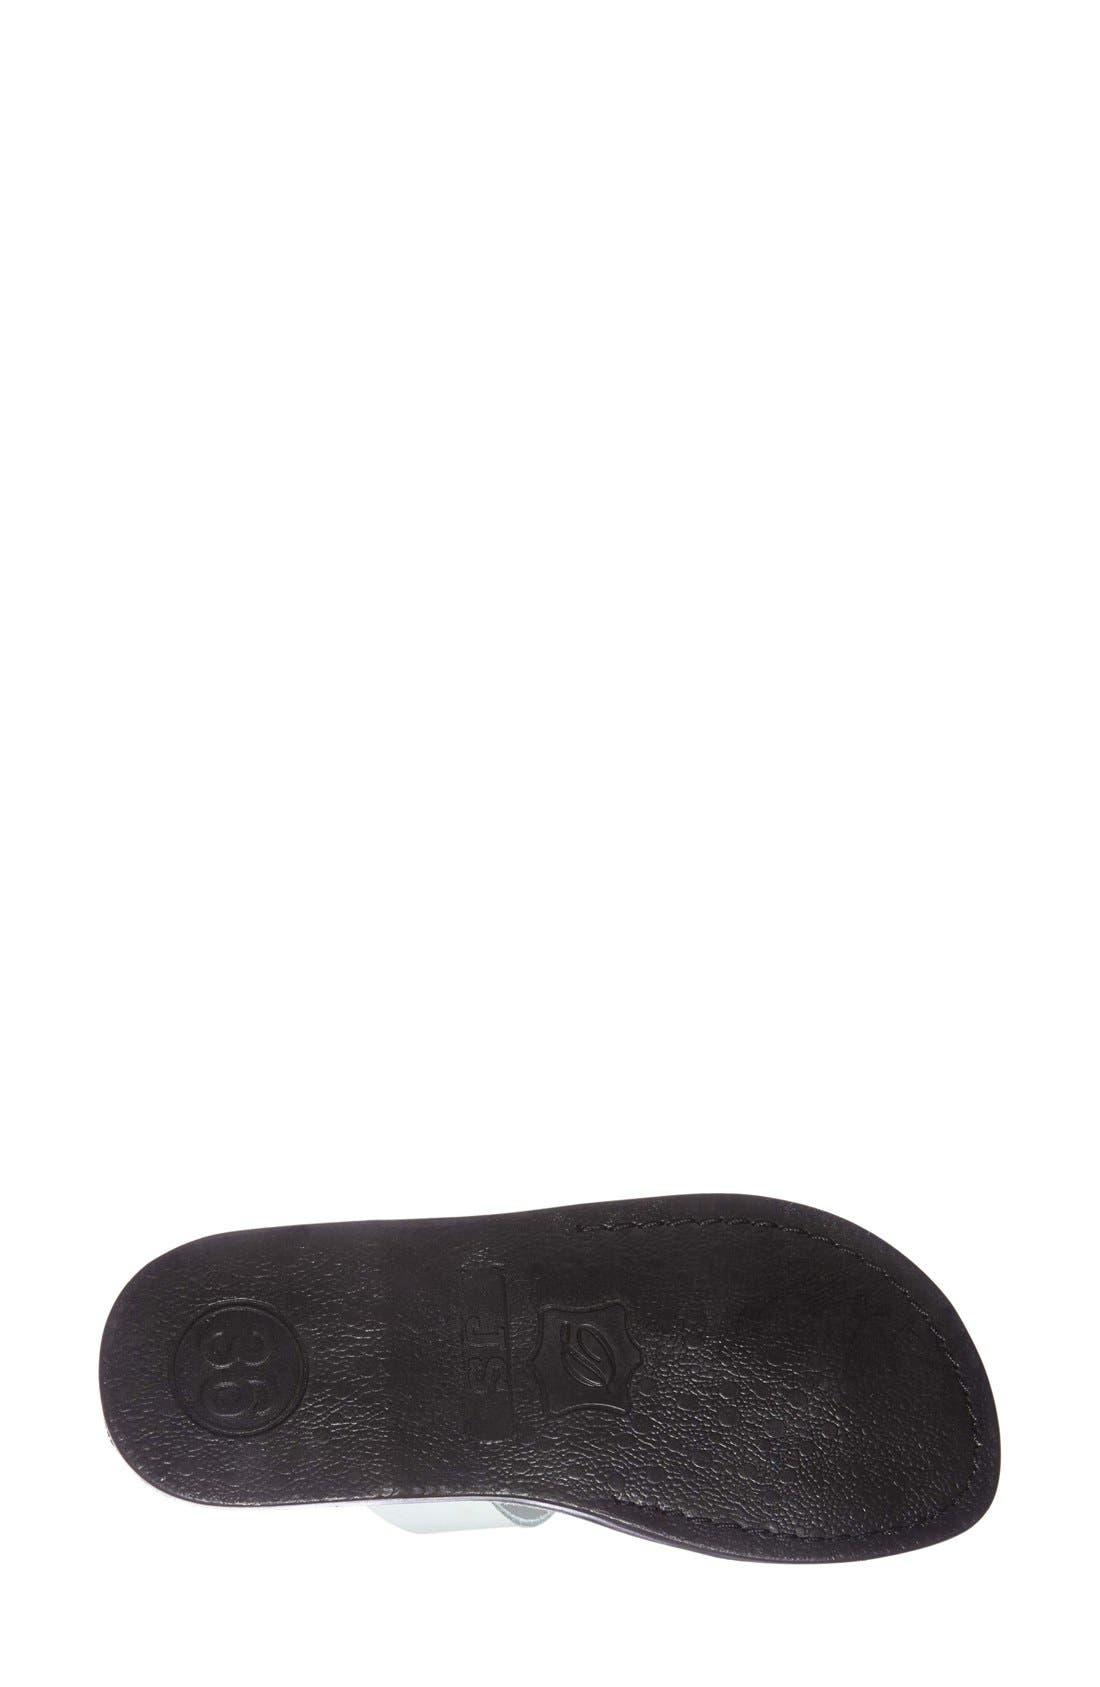 'The Good Shepard' Leather Sandal,                             Alternate thumbnail 28, color,